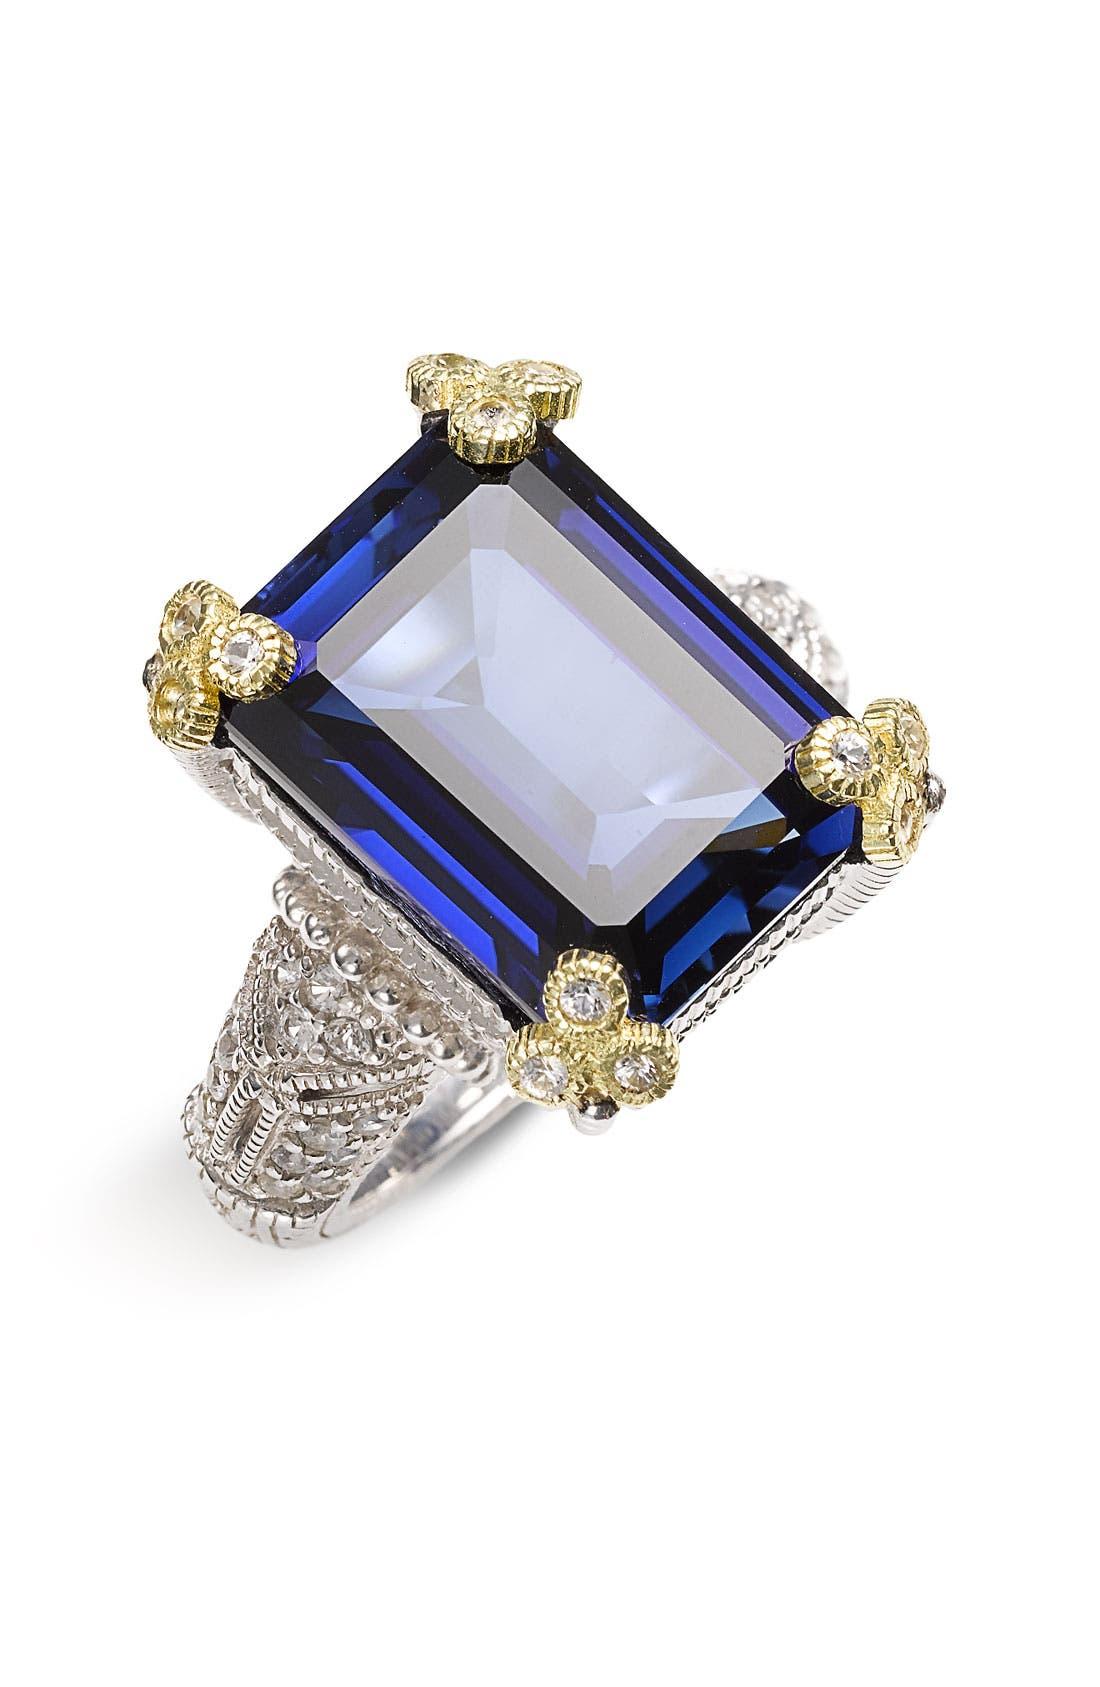 Main Image - Judith Ripka 'Estate' Emerald Cut Stone Ring